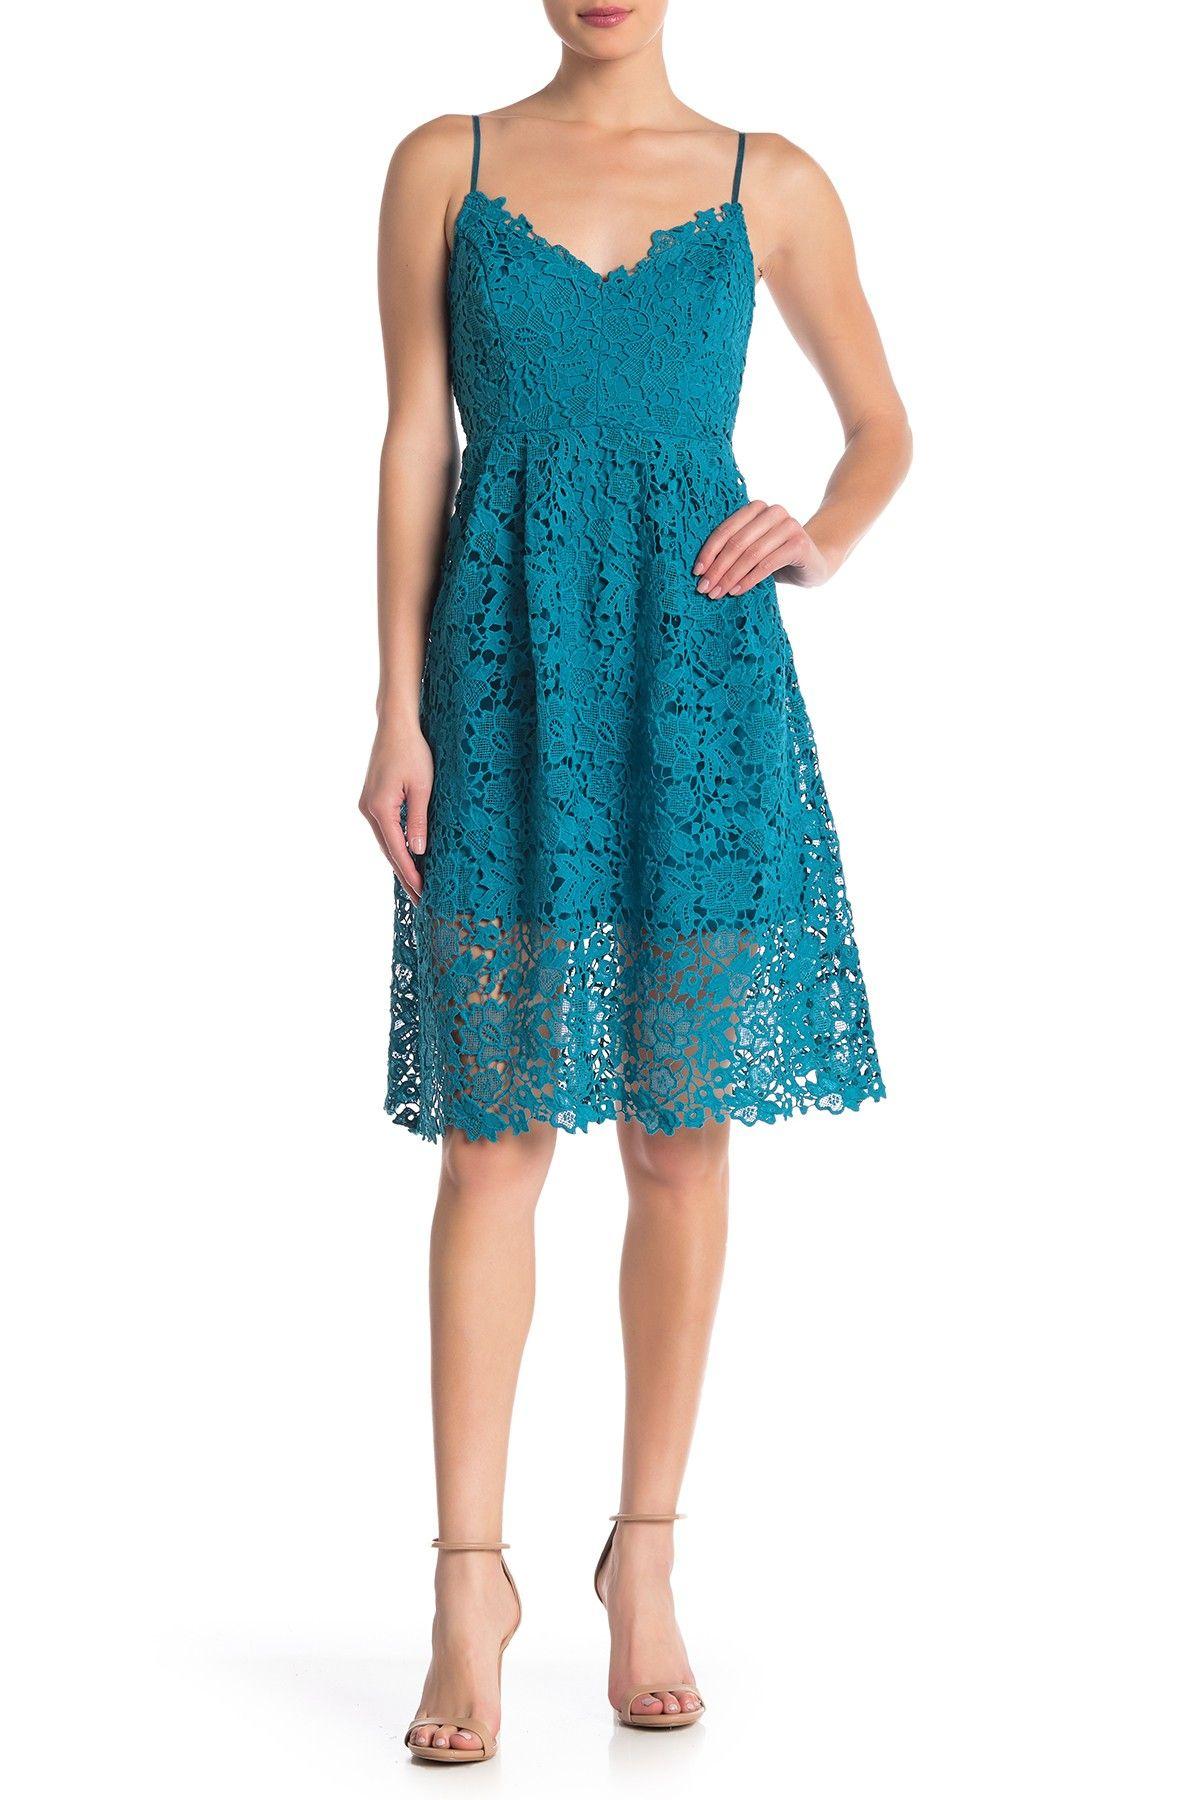 Astr The Label Lace A Line Dress Nordstrom Rack Lace A Line Dress A Line Dress Dresses [ 1800 x 1200 Pixel ]